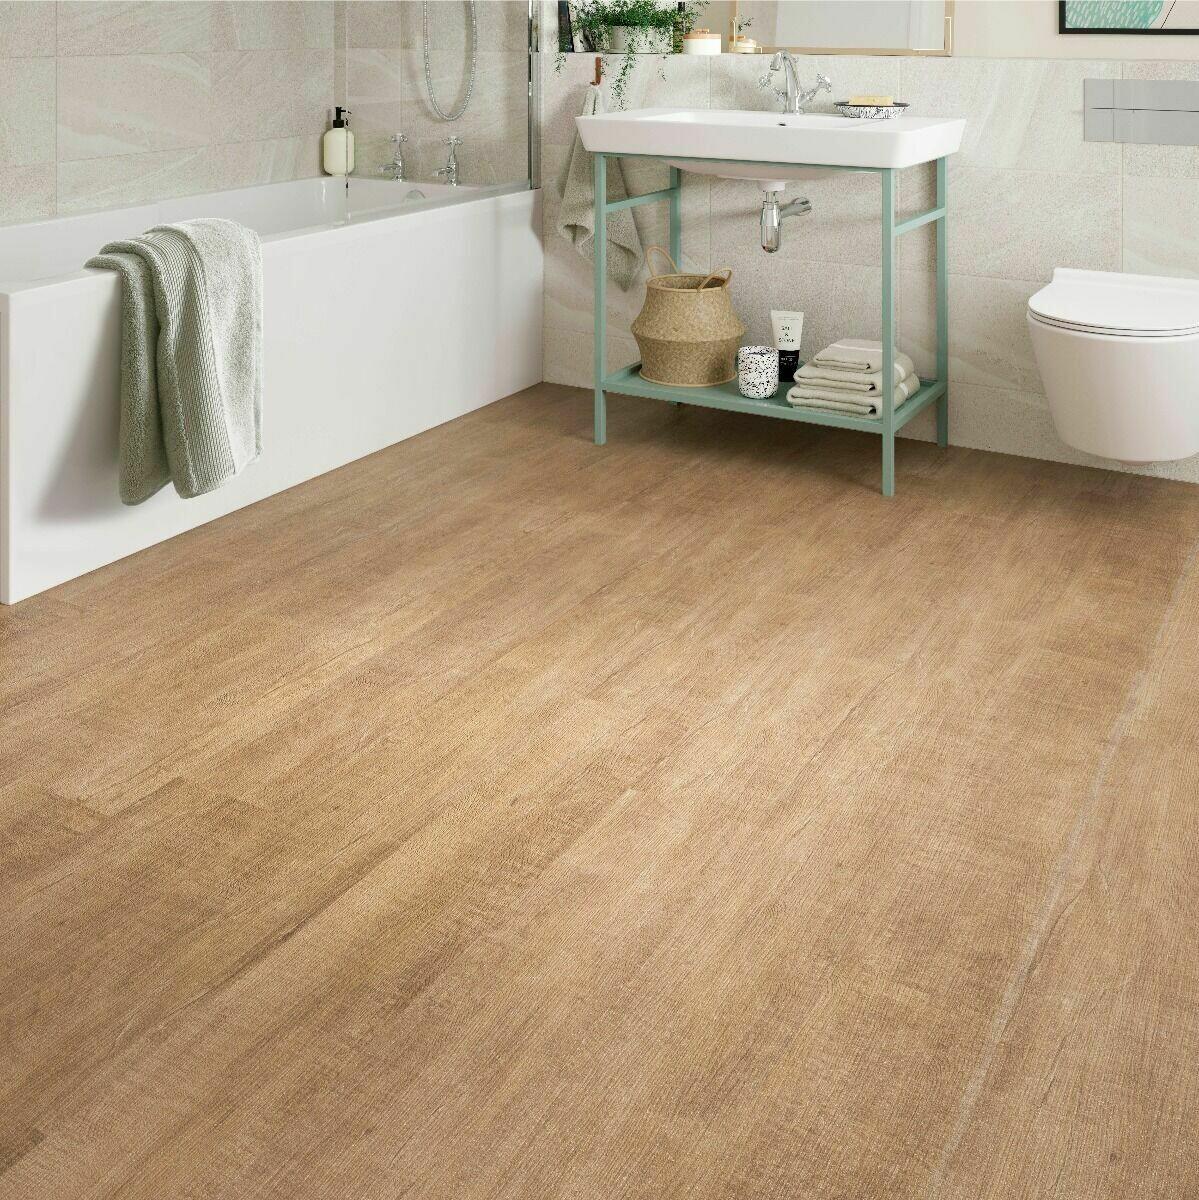 Warm Maple ClicLux LVT Flooring 121.9 cm  x 17.7 cm